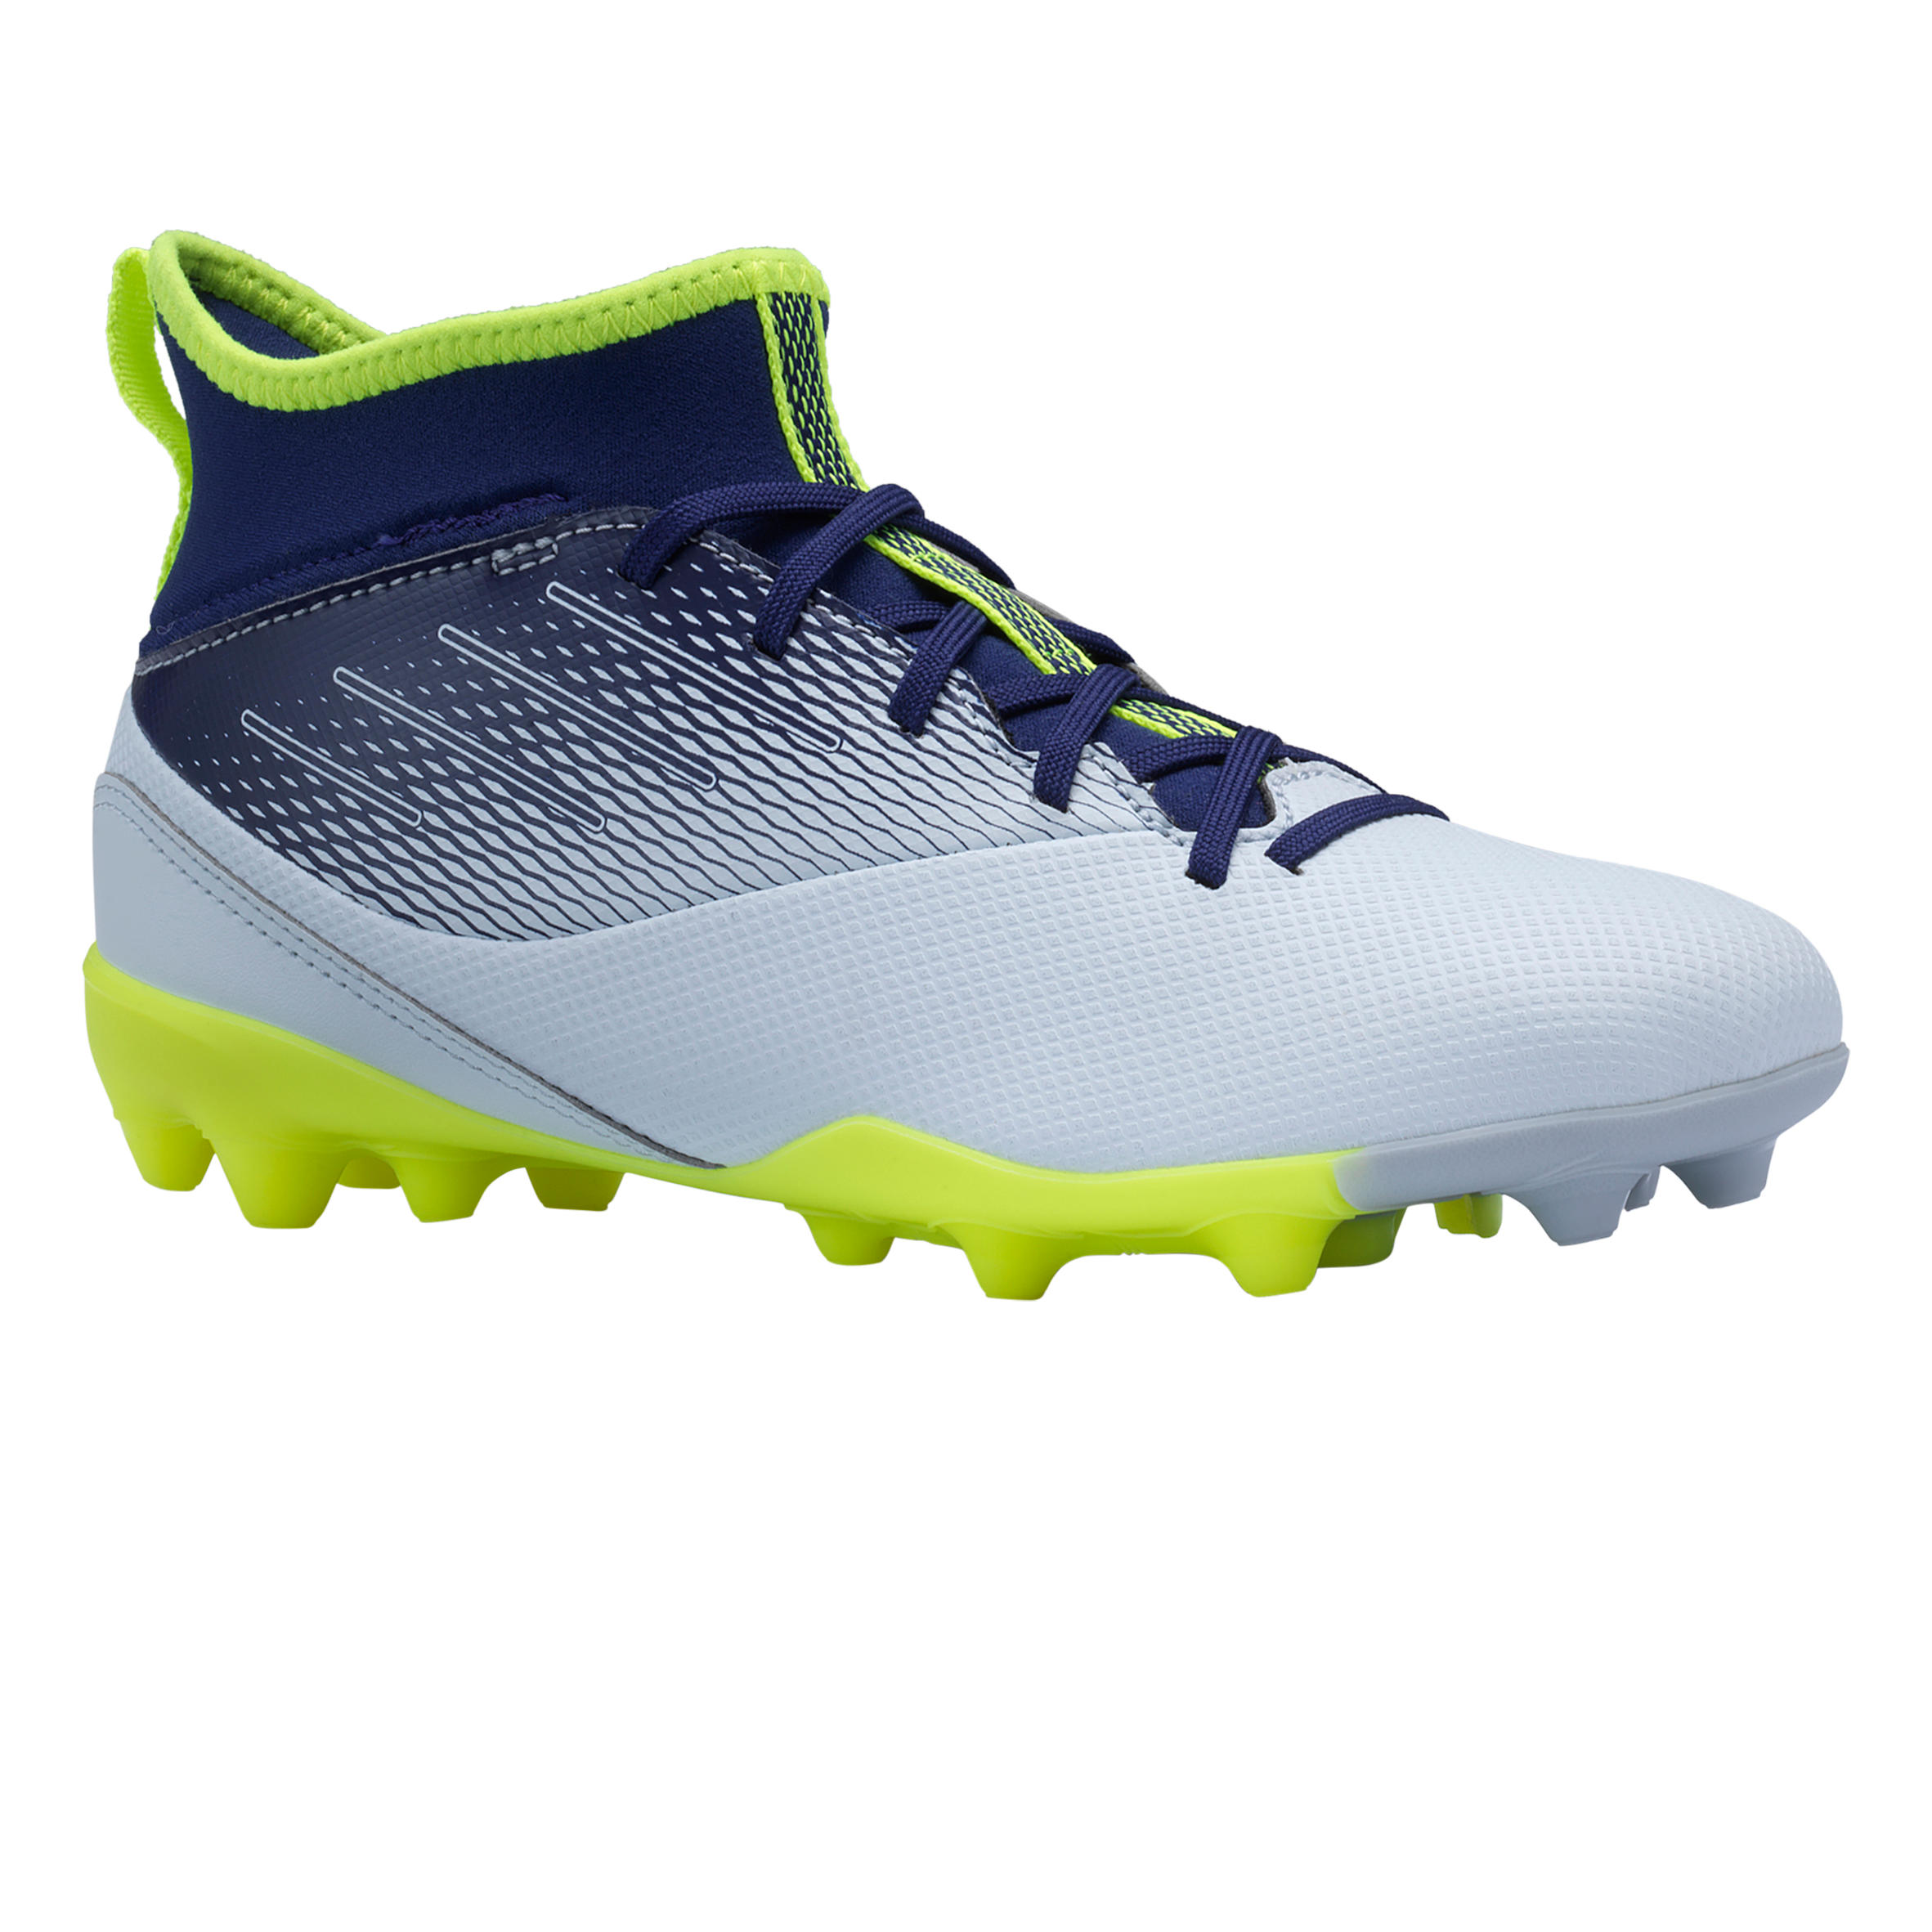 De De Chaussures Adulteamp; Chaussures Football Adulteamp; Enfants Football 4Aq5Rj3L